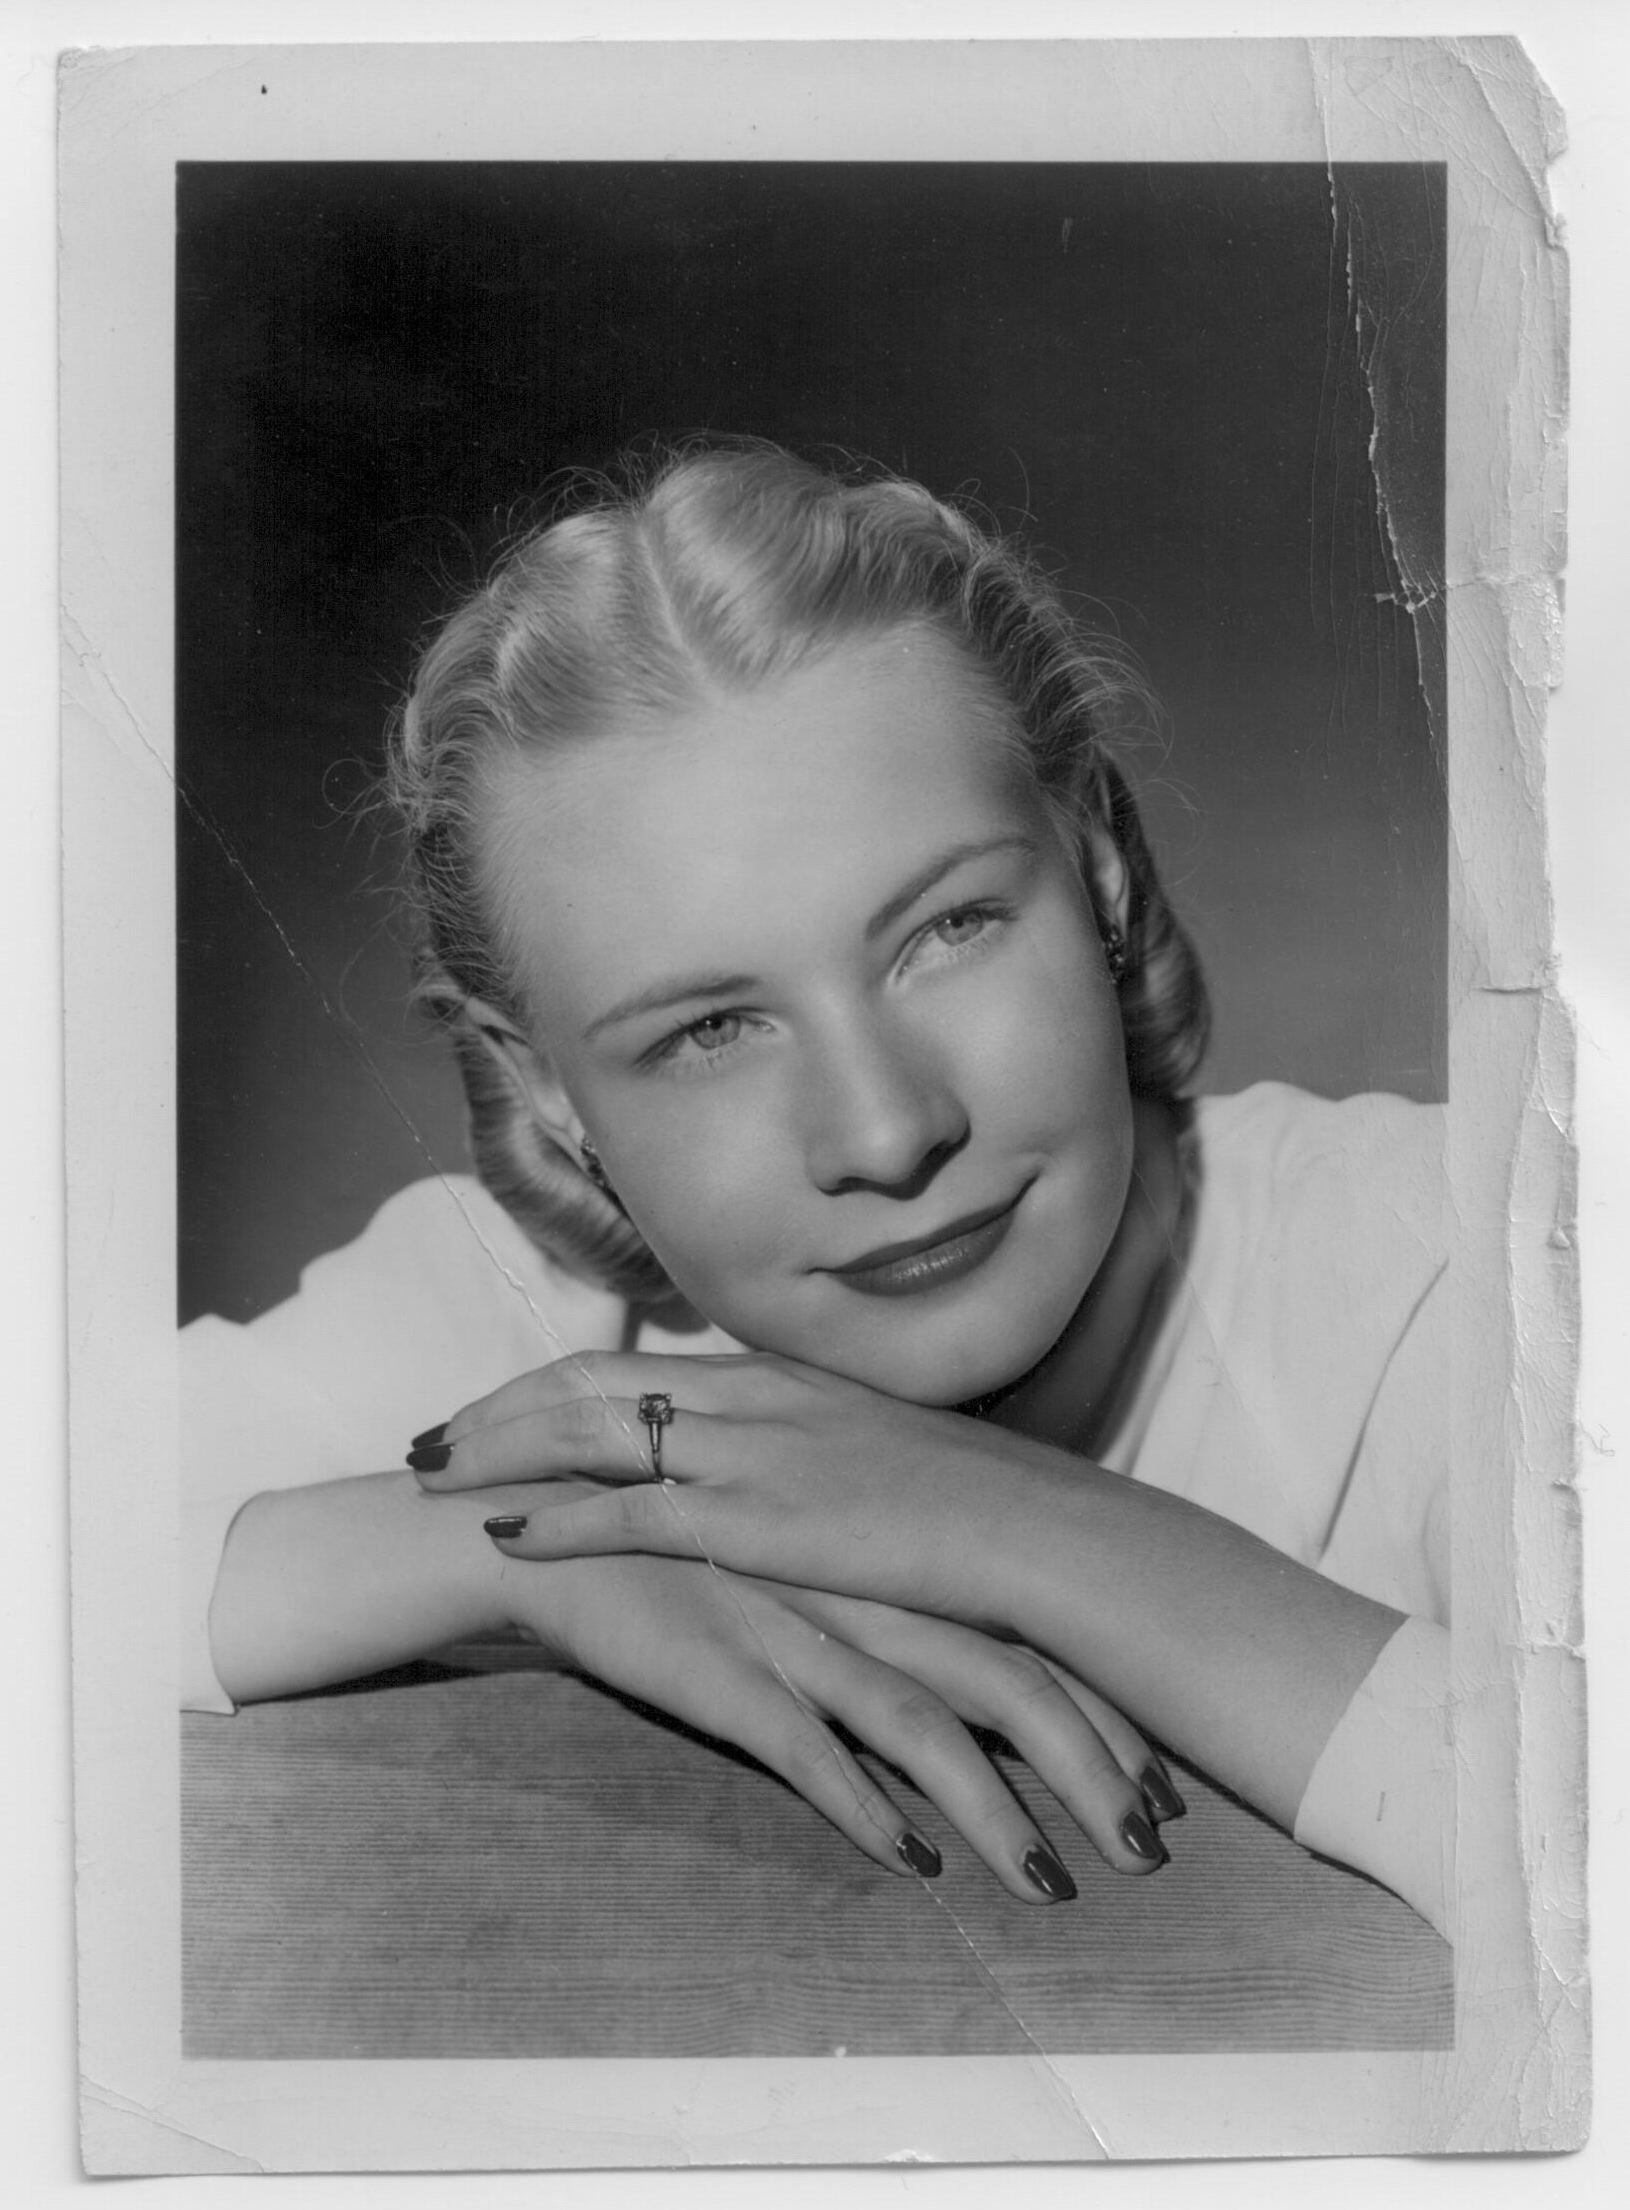 Rosaline Dolak De Dan, Age 18